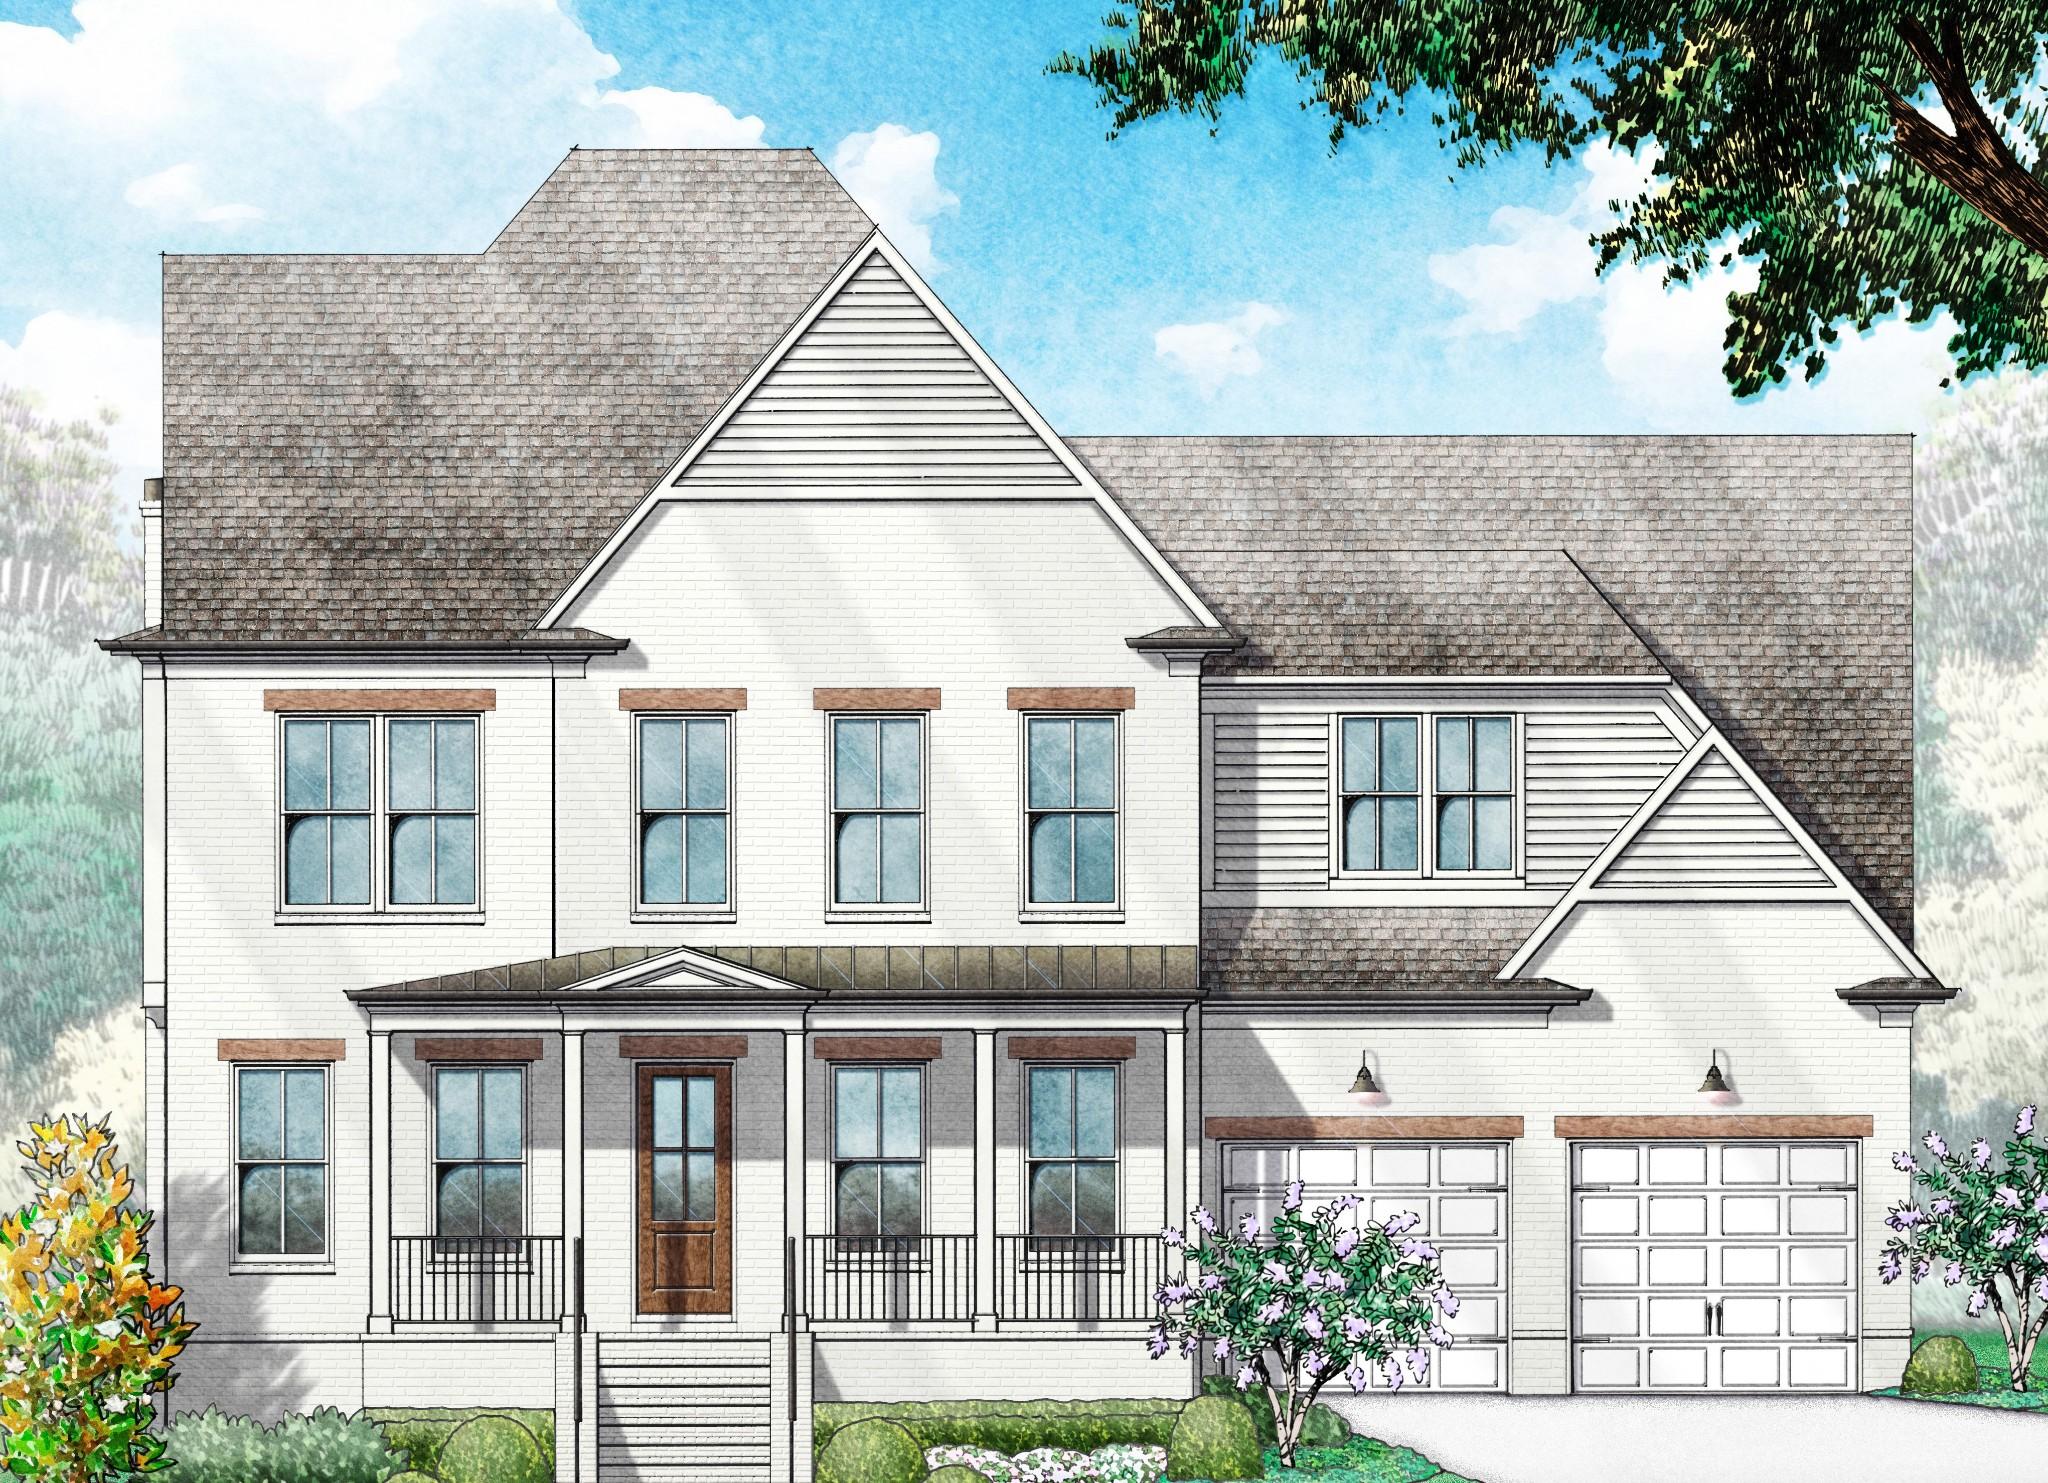 955 Cheltenham Ave, Lot # 2136 Property Photo - Franklin, TN real estate listing